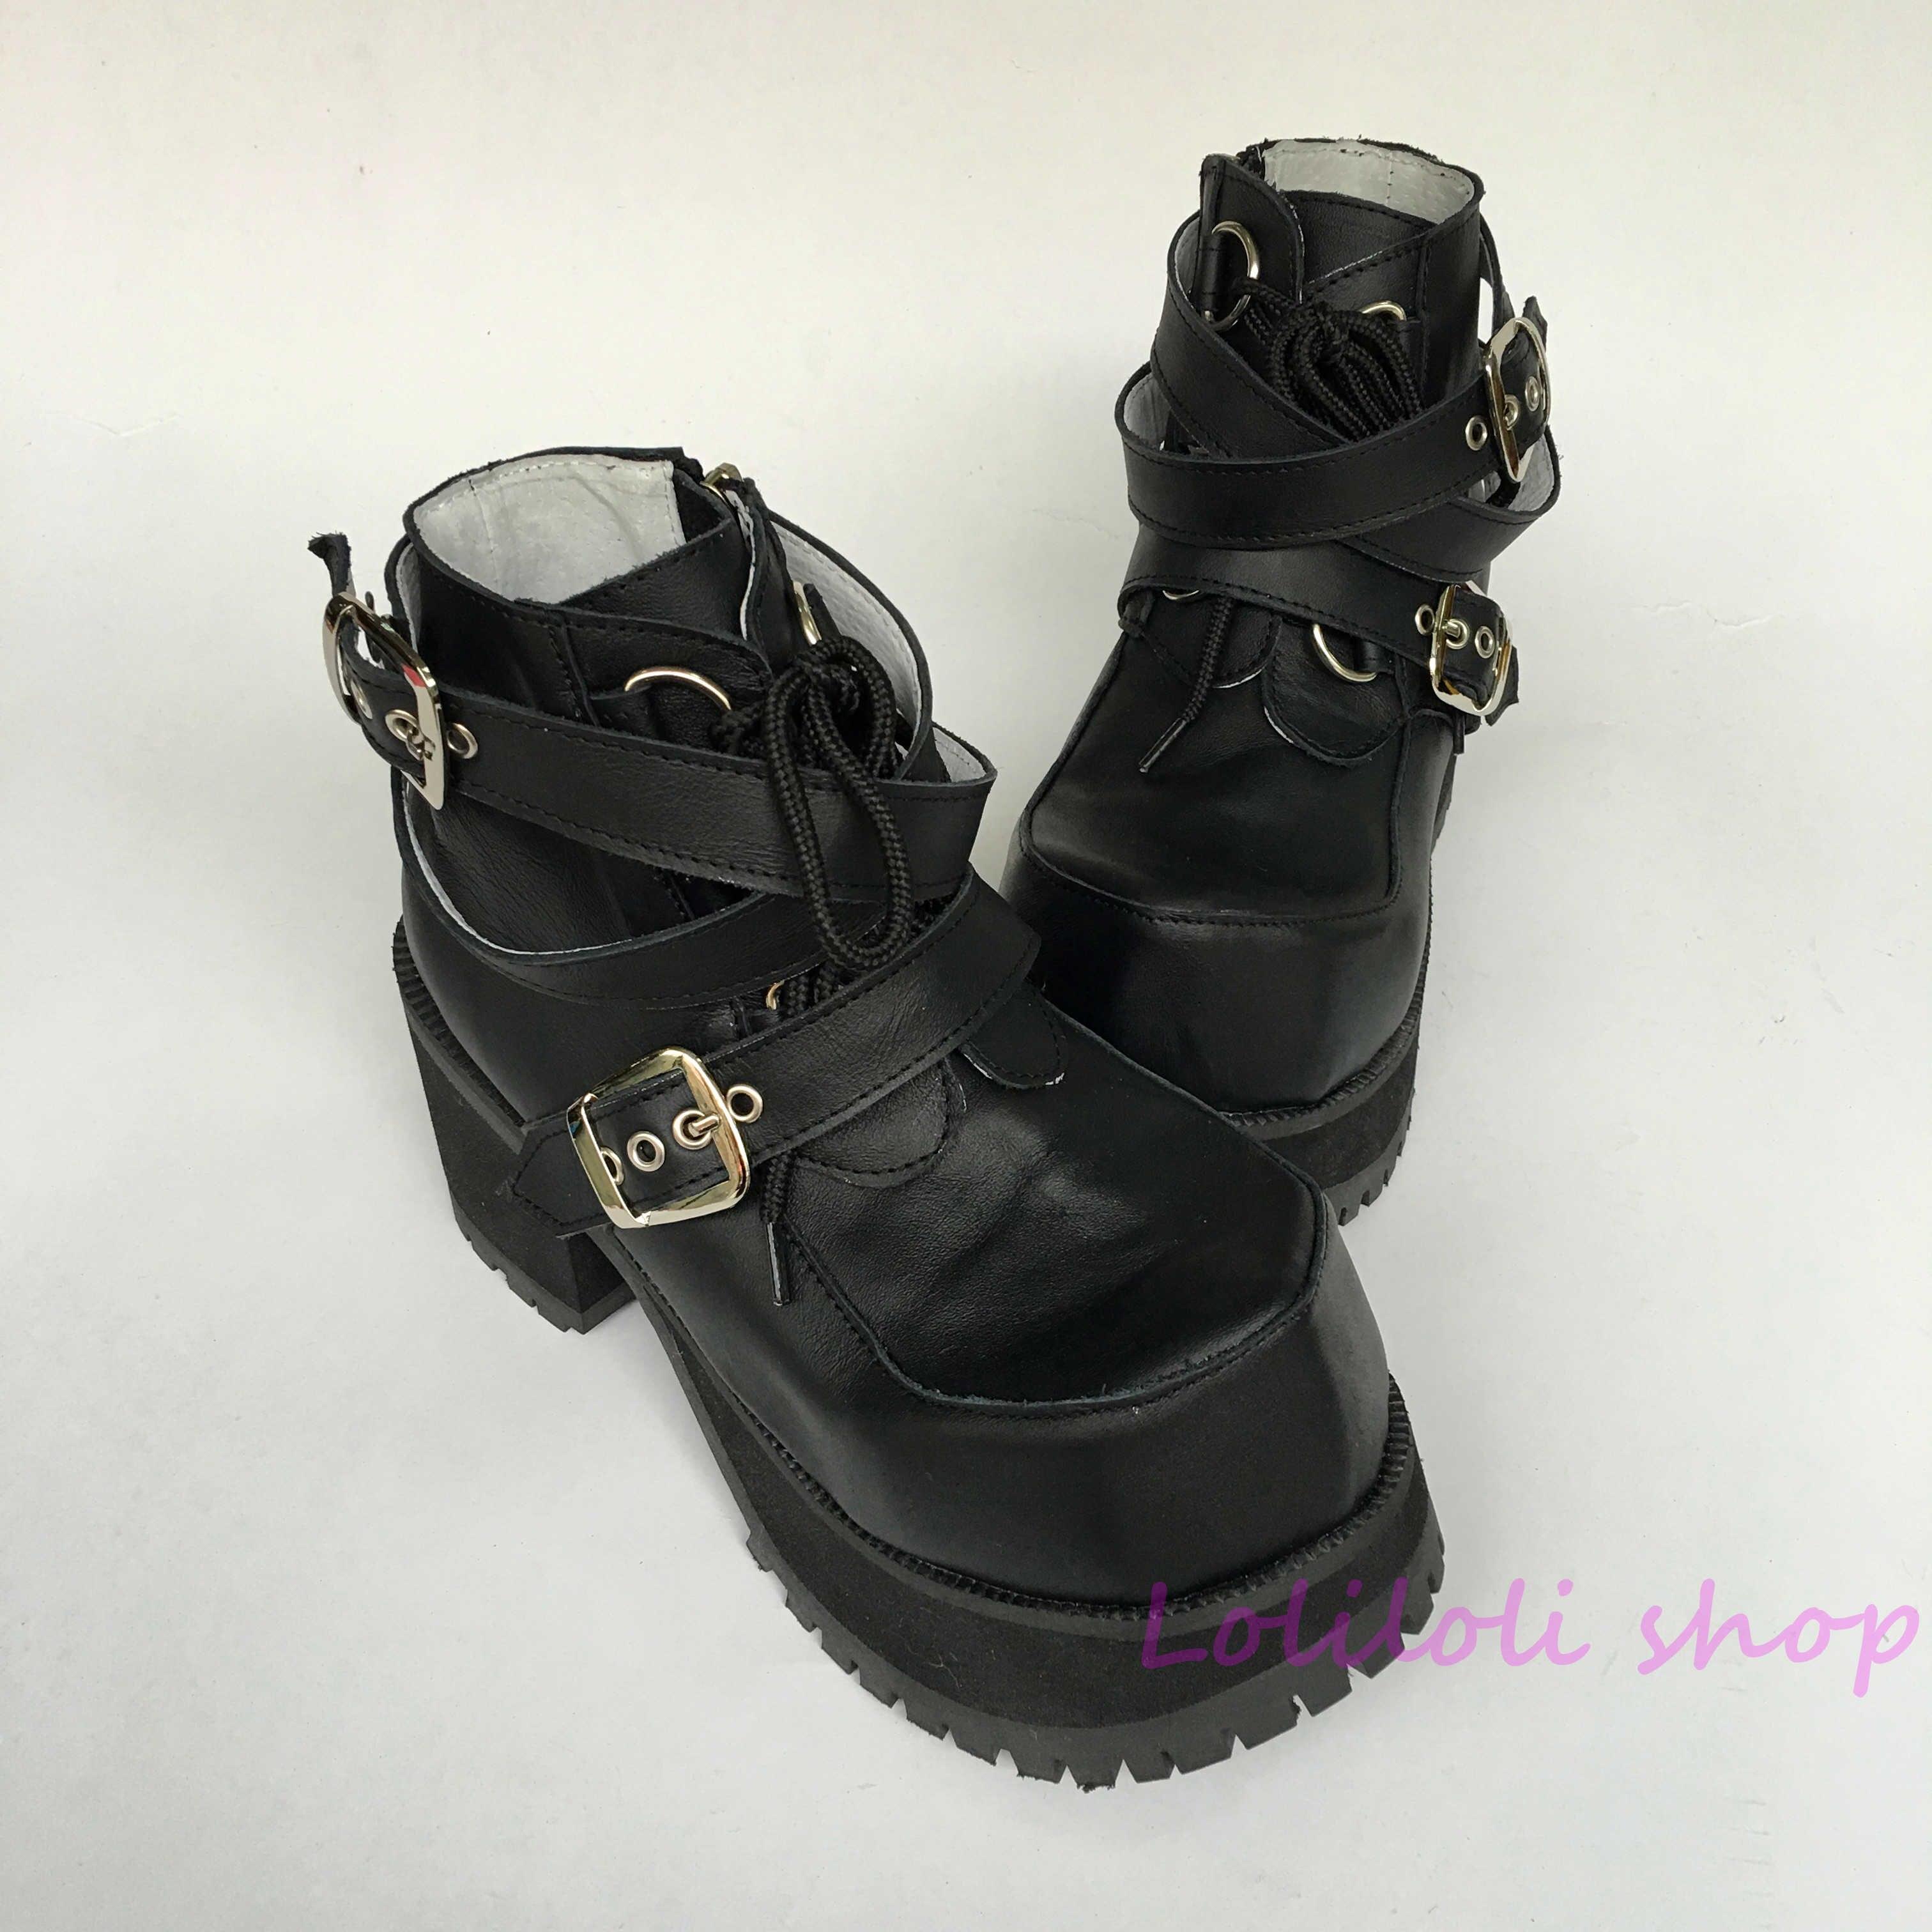 Kuh Kordelzug Hand Leder Schuhe Süße Lolita Größe Große Made Ferse Mehrfach Anpassung Kunden Prinzessin Platz Schwarz An9102 PIqSwxqF8